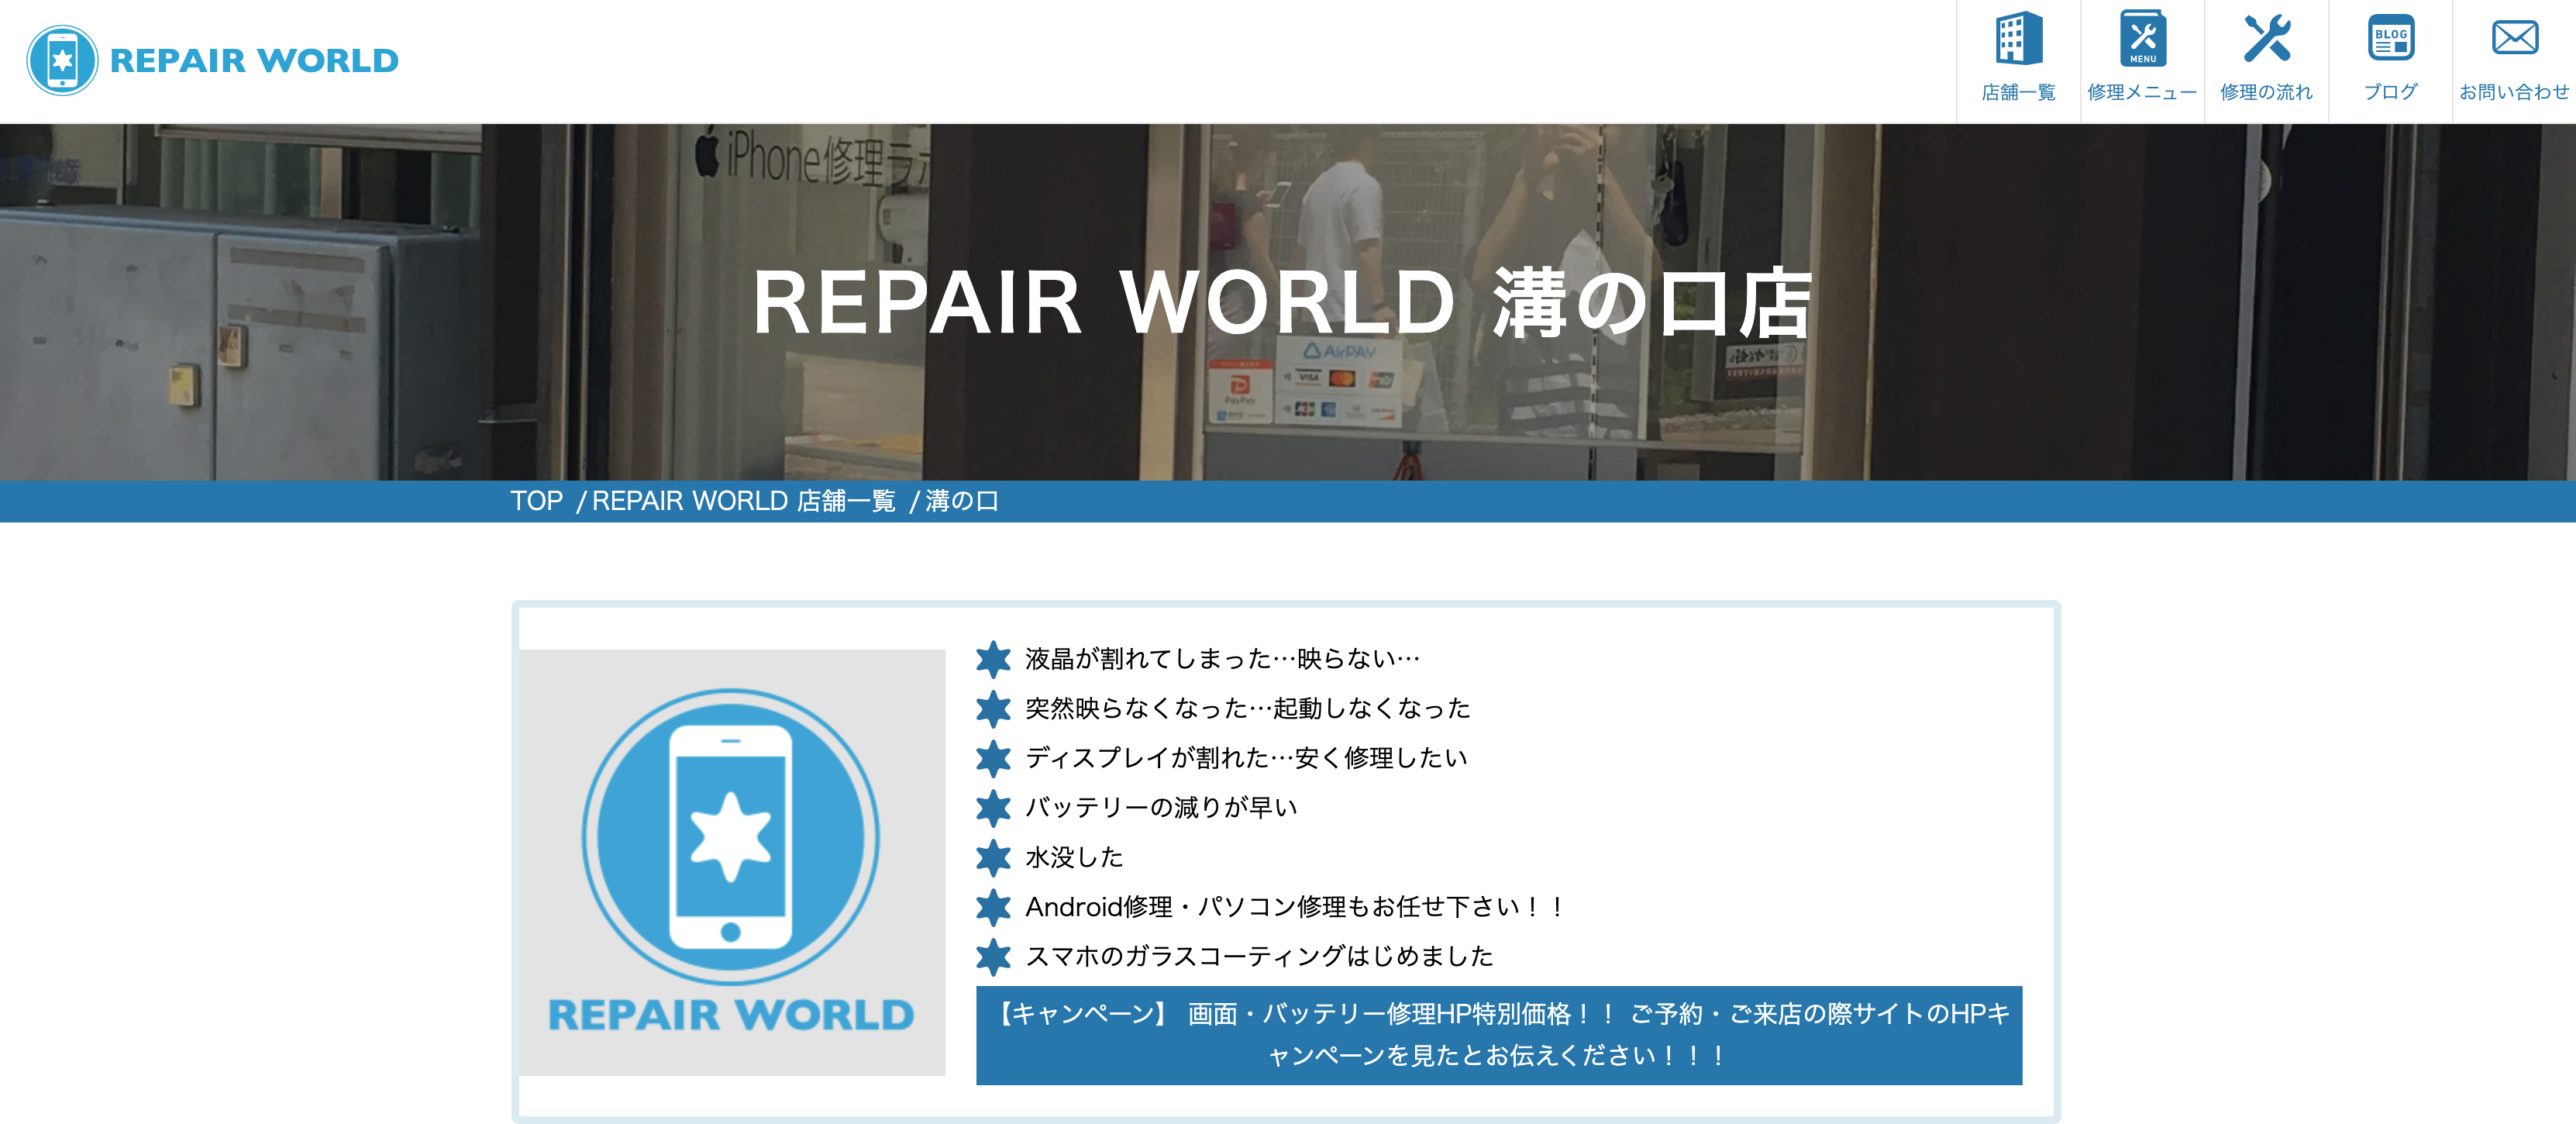 RepairWorld 溝の口店